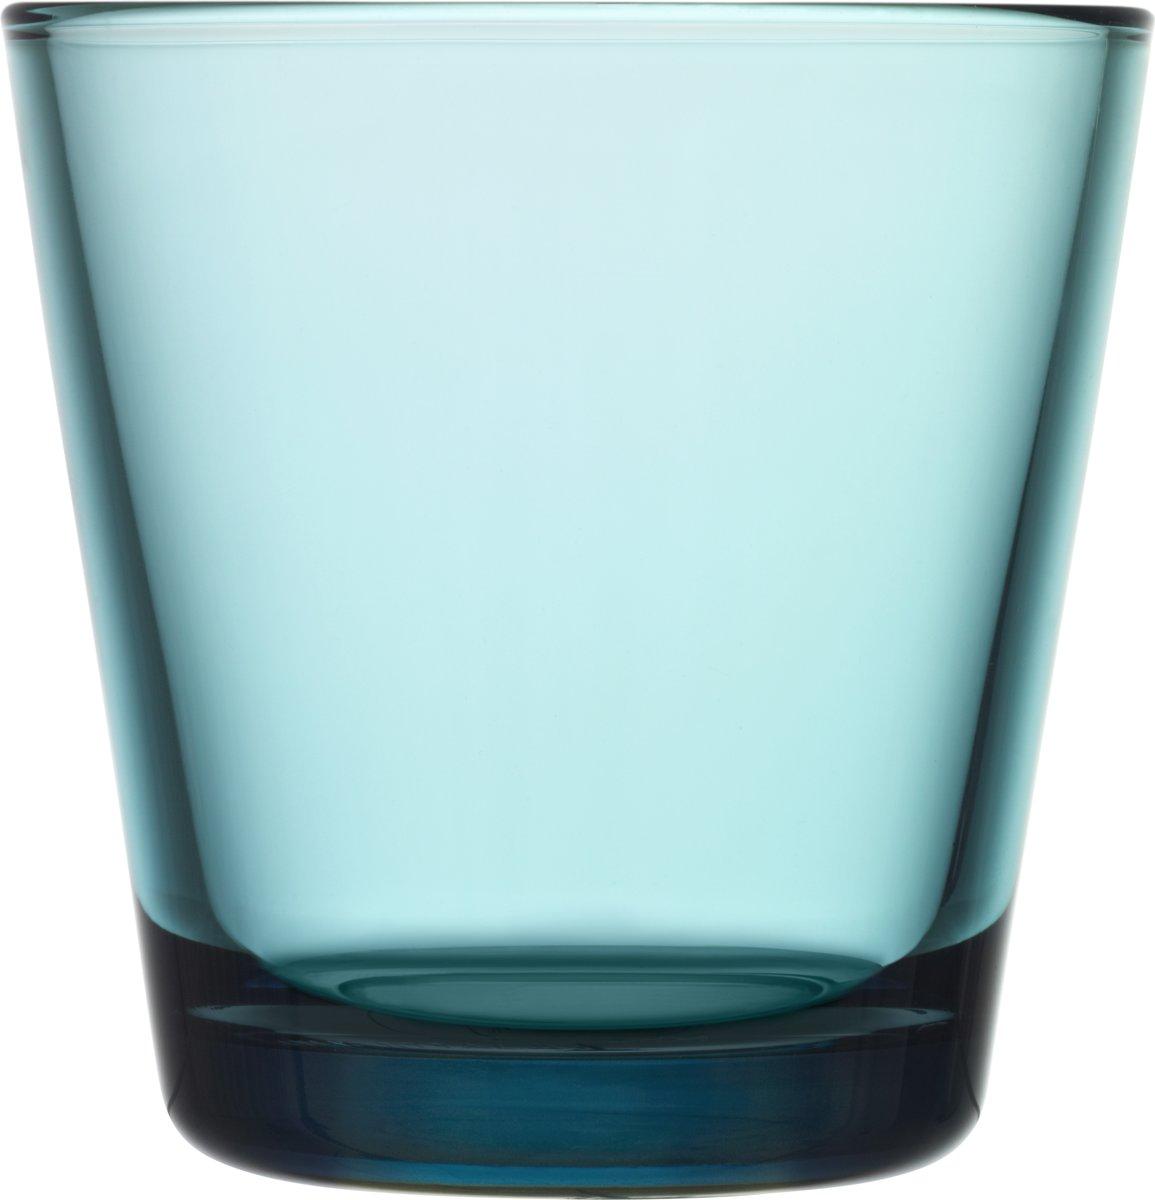 Iittala Kartio Glas - 21 cl - Zeeblauw - 2 stuks